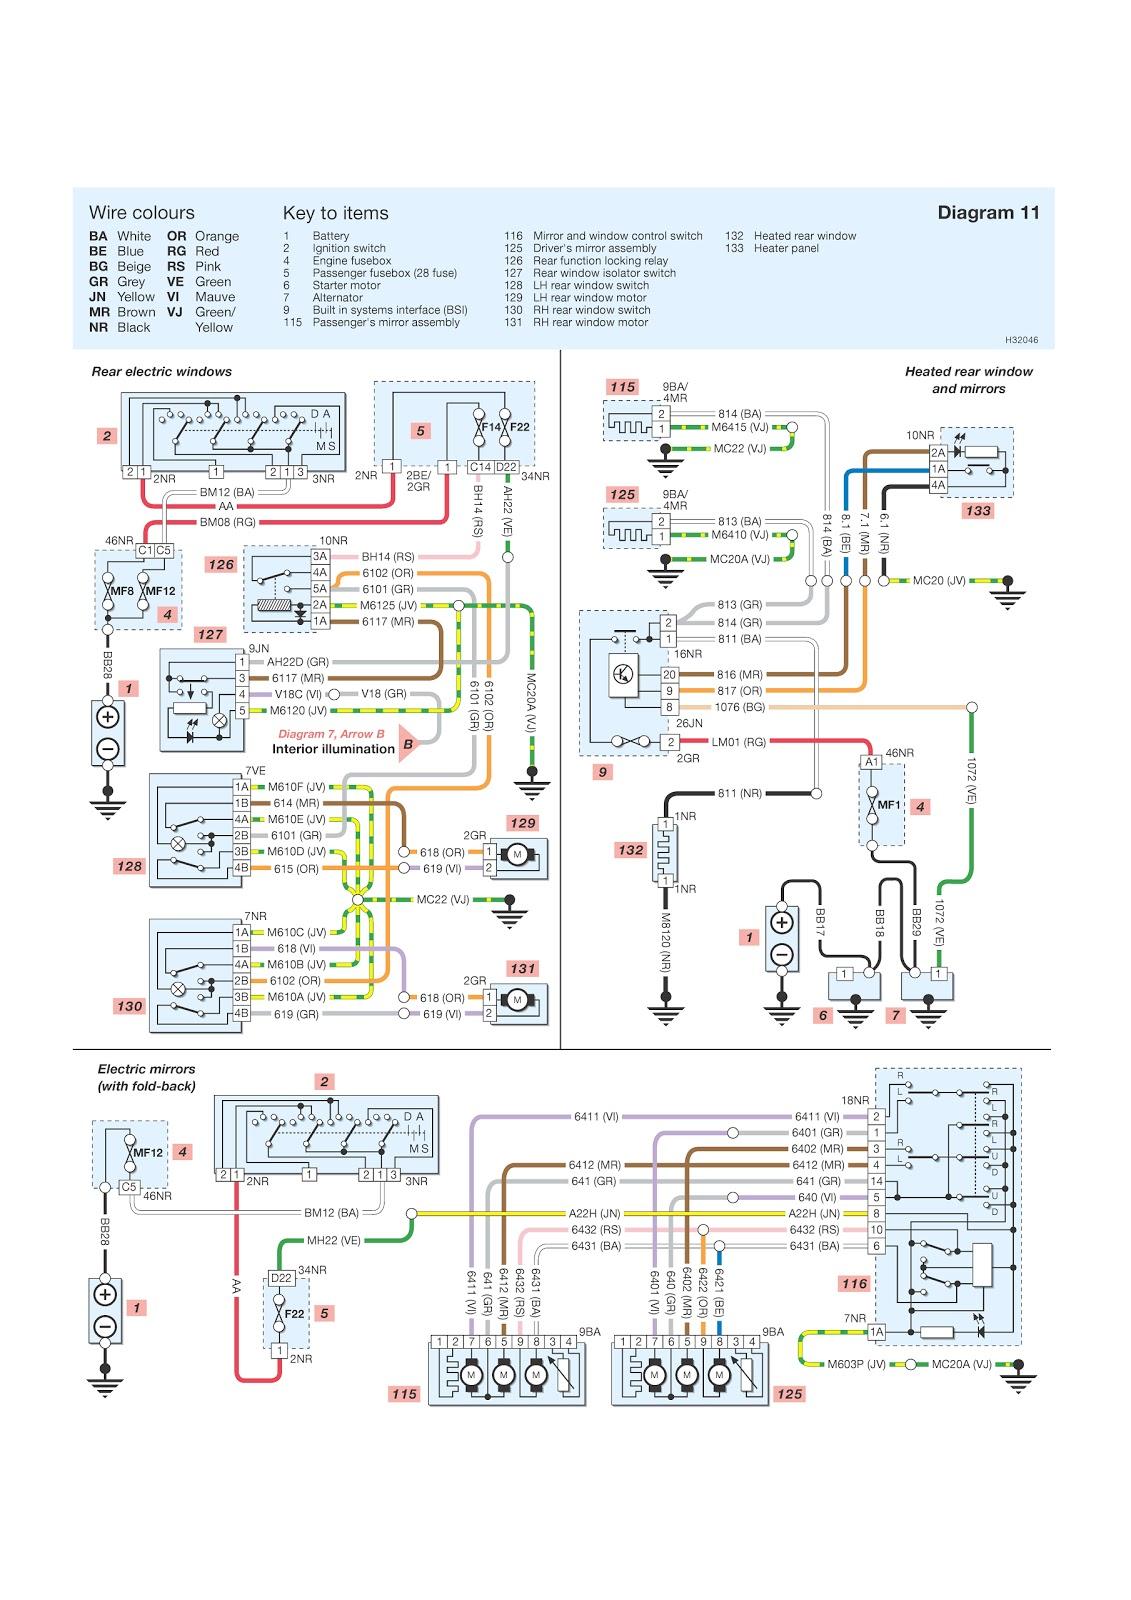 wonderful peugeot 7 cc wiring diagram photos best image engine rh guigou us Submersible Well Pump Wiring Diagram Diagram of Pool Pump Connections